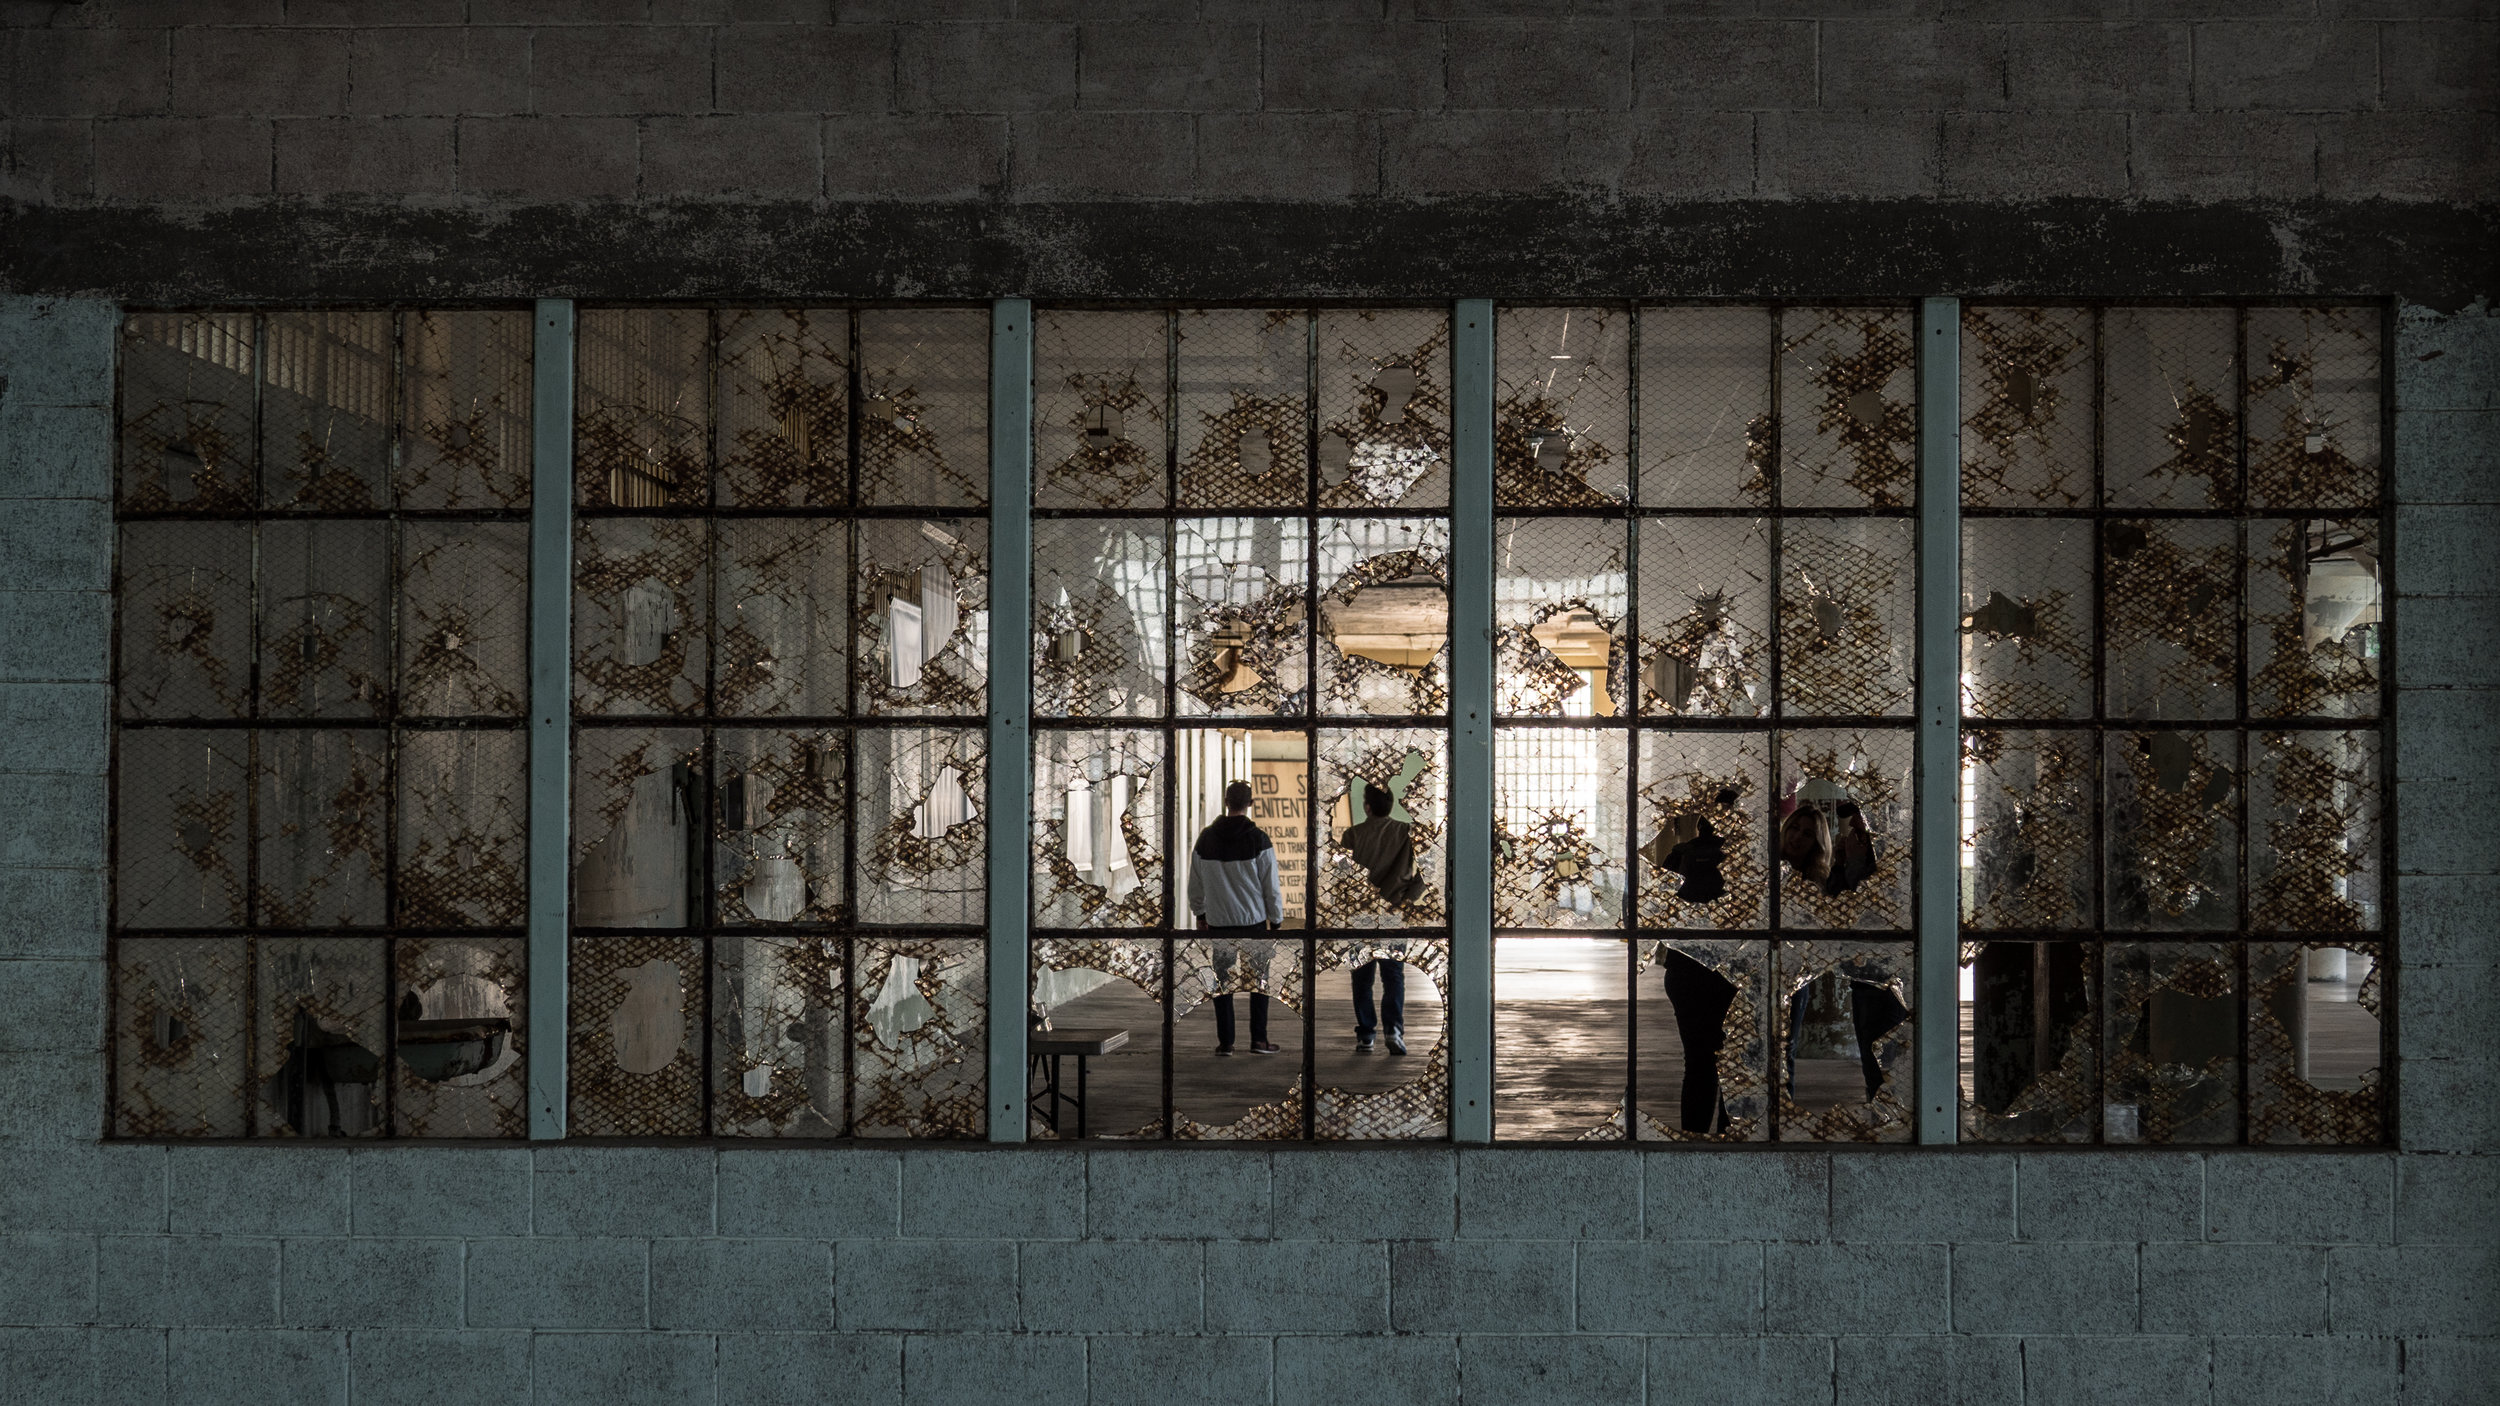 The beautiful broken windows of Alcatraz inspired all of us!!